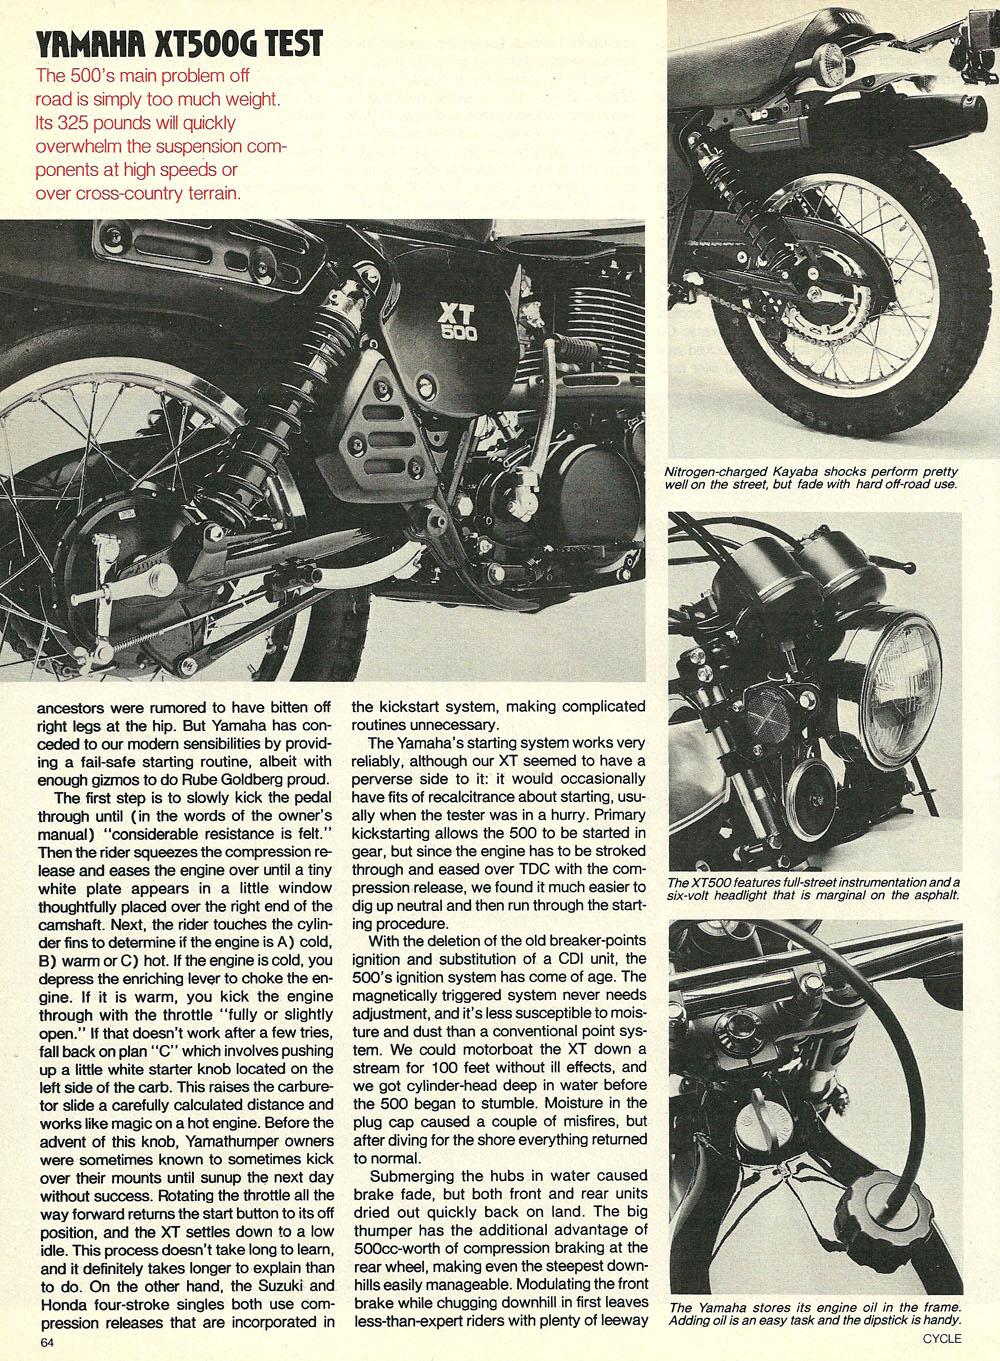 1980 Yamaha XT500G road test 04.jpg